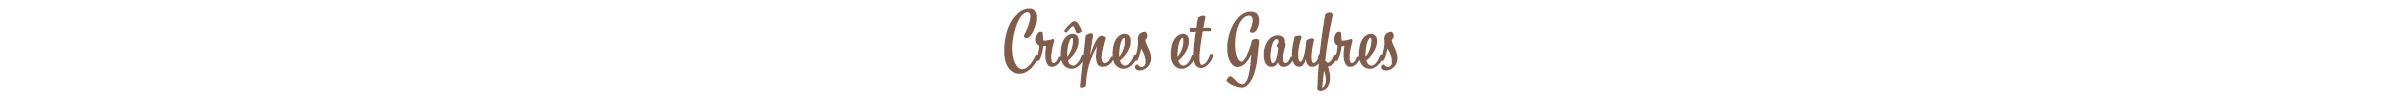 Wording-crepes-et-gaufres